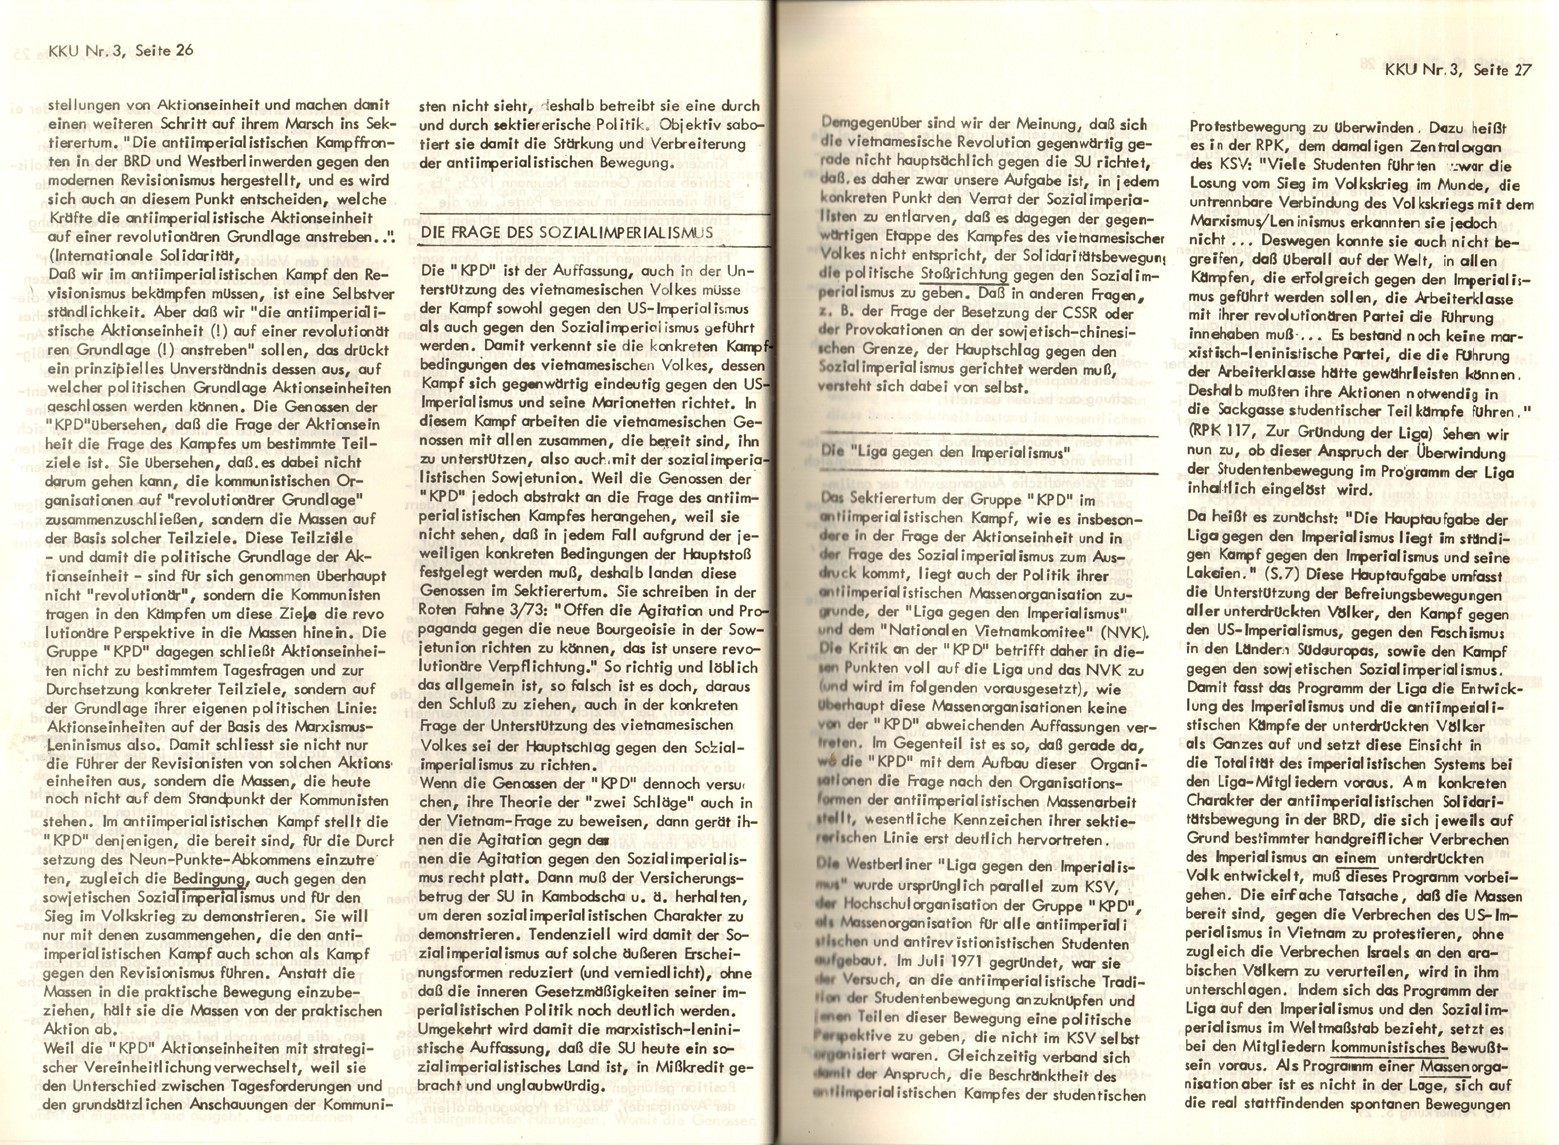 Frankfurt_Offenbach_KG_Kampf_Kritik_Umgestaltung_1973_03_15